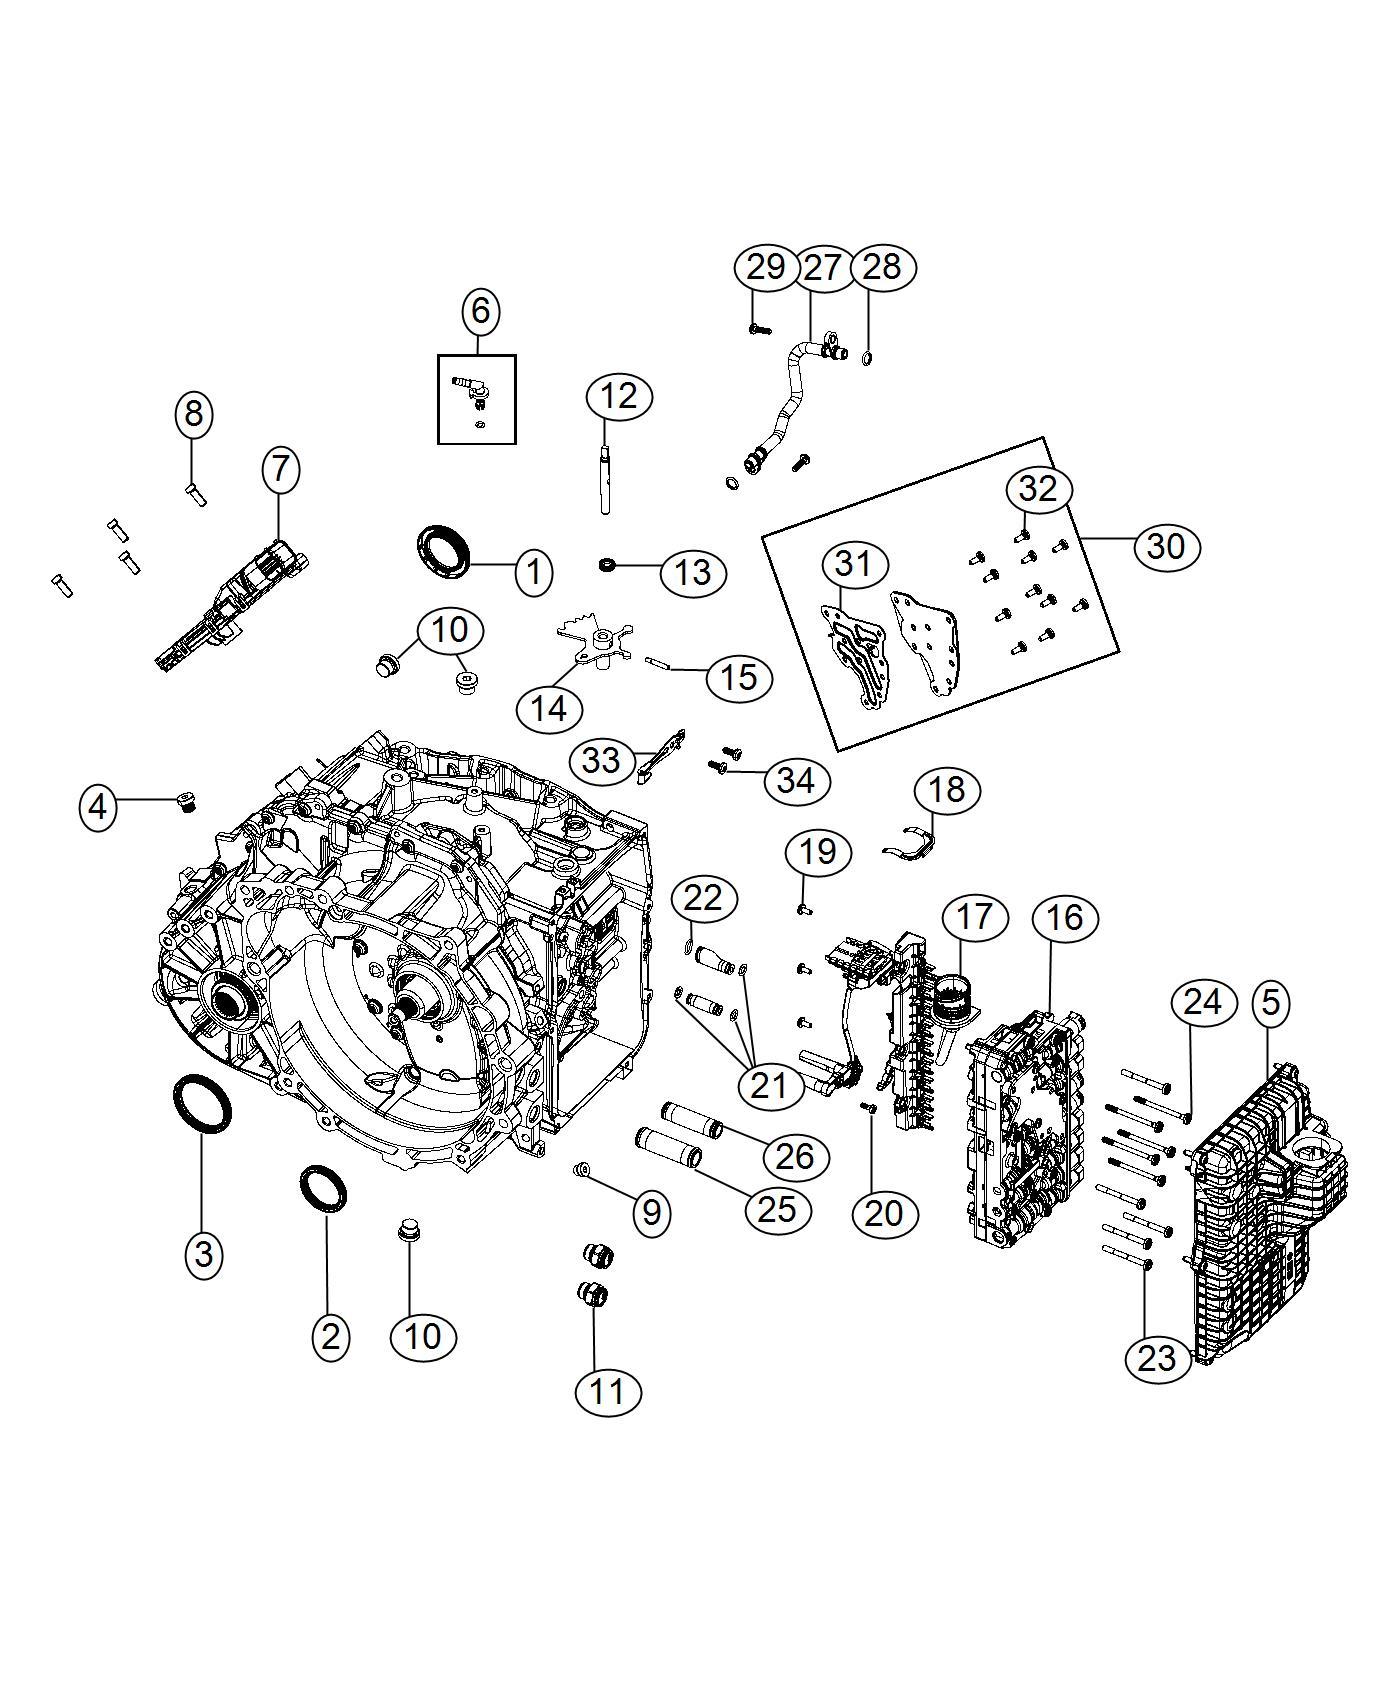 Ram Promaster City Wagon Retainer Wiring Harness